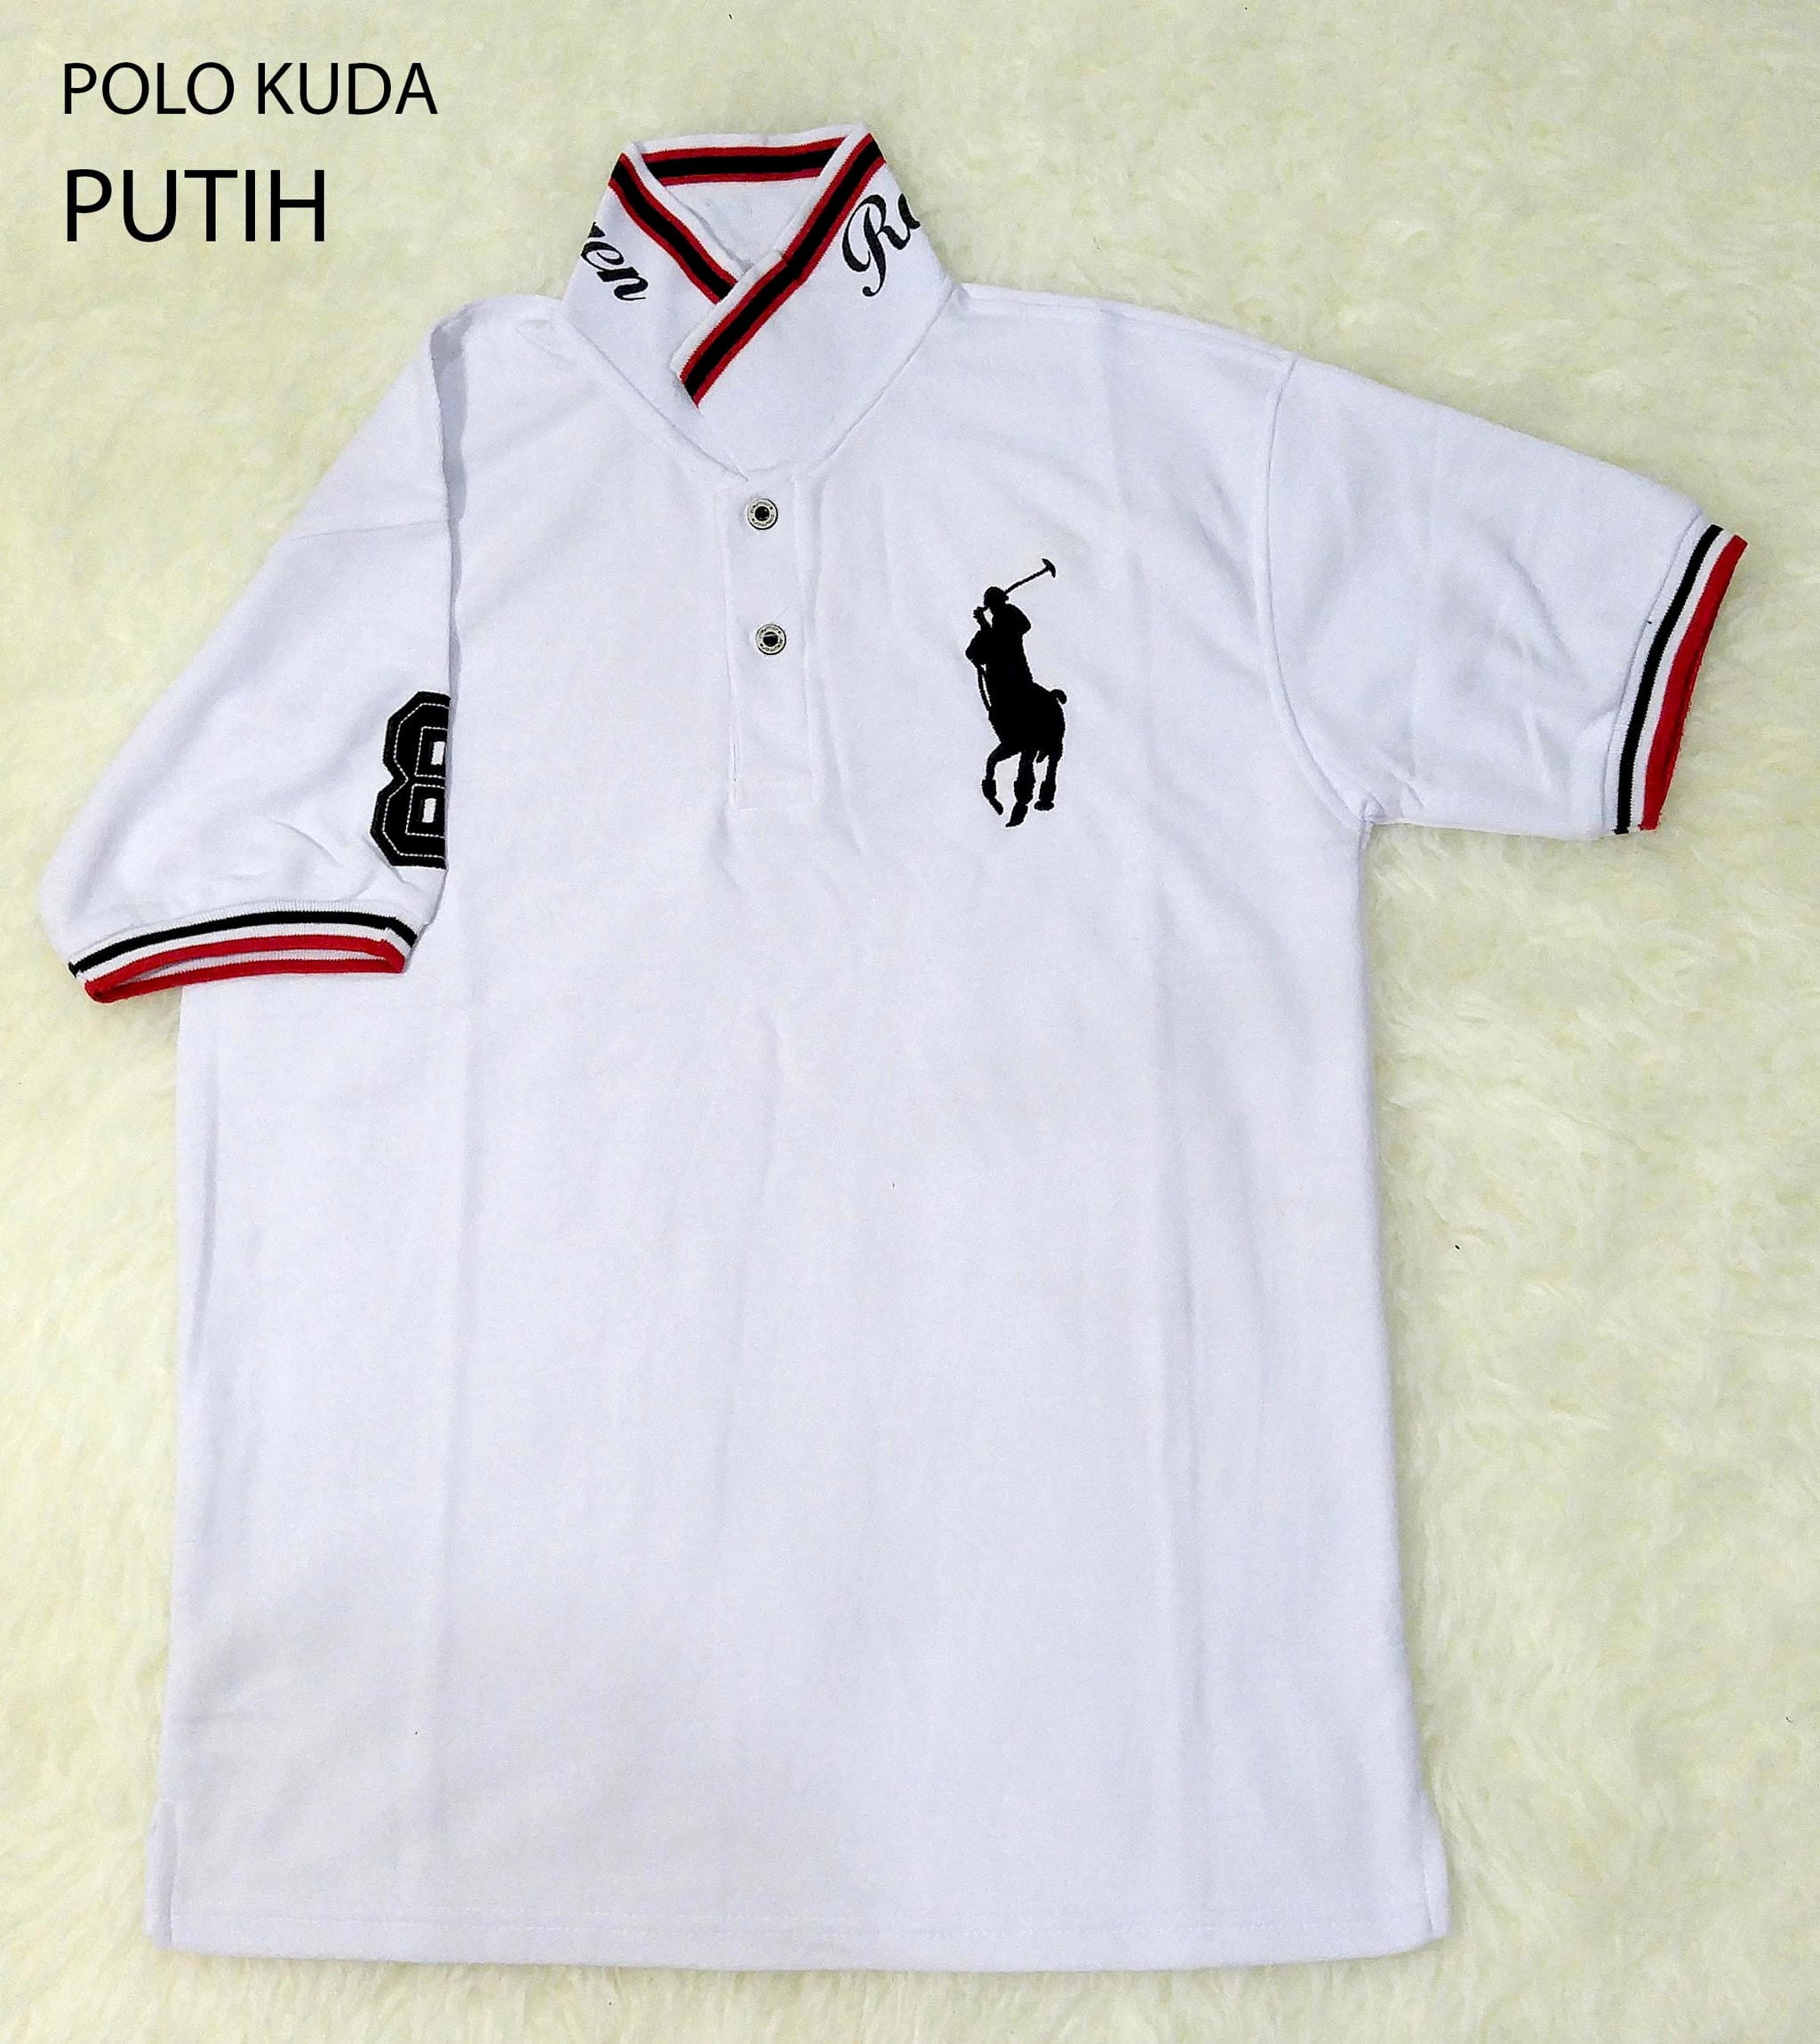 Lauren Harga Dreamworks Shirt T Polo Ralph 8w0ONnPkX